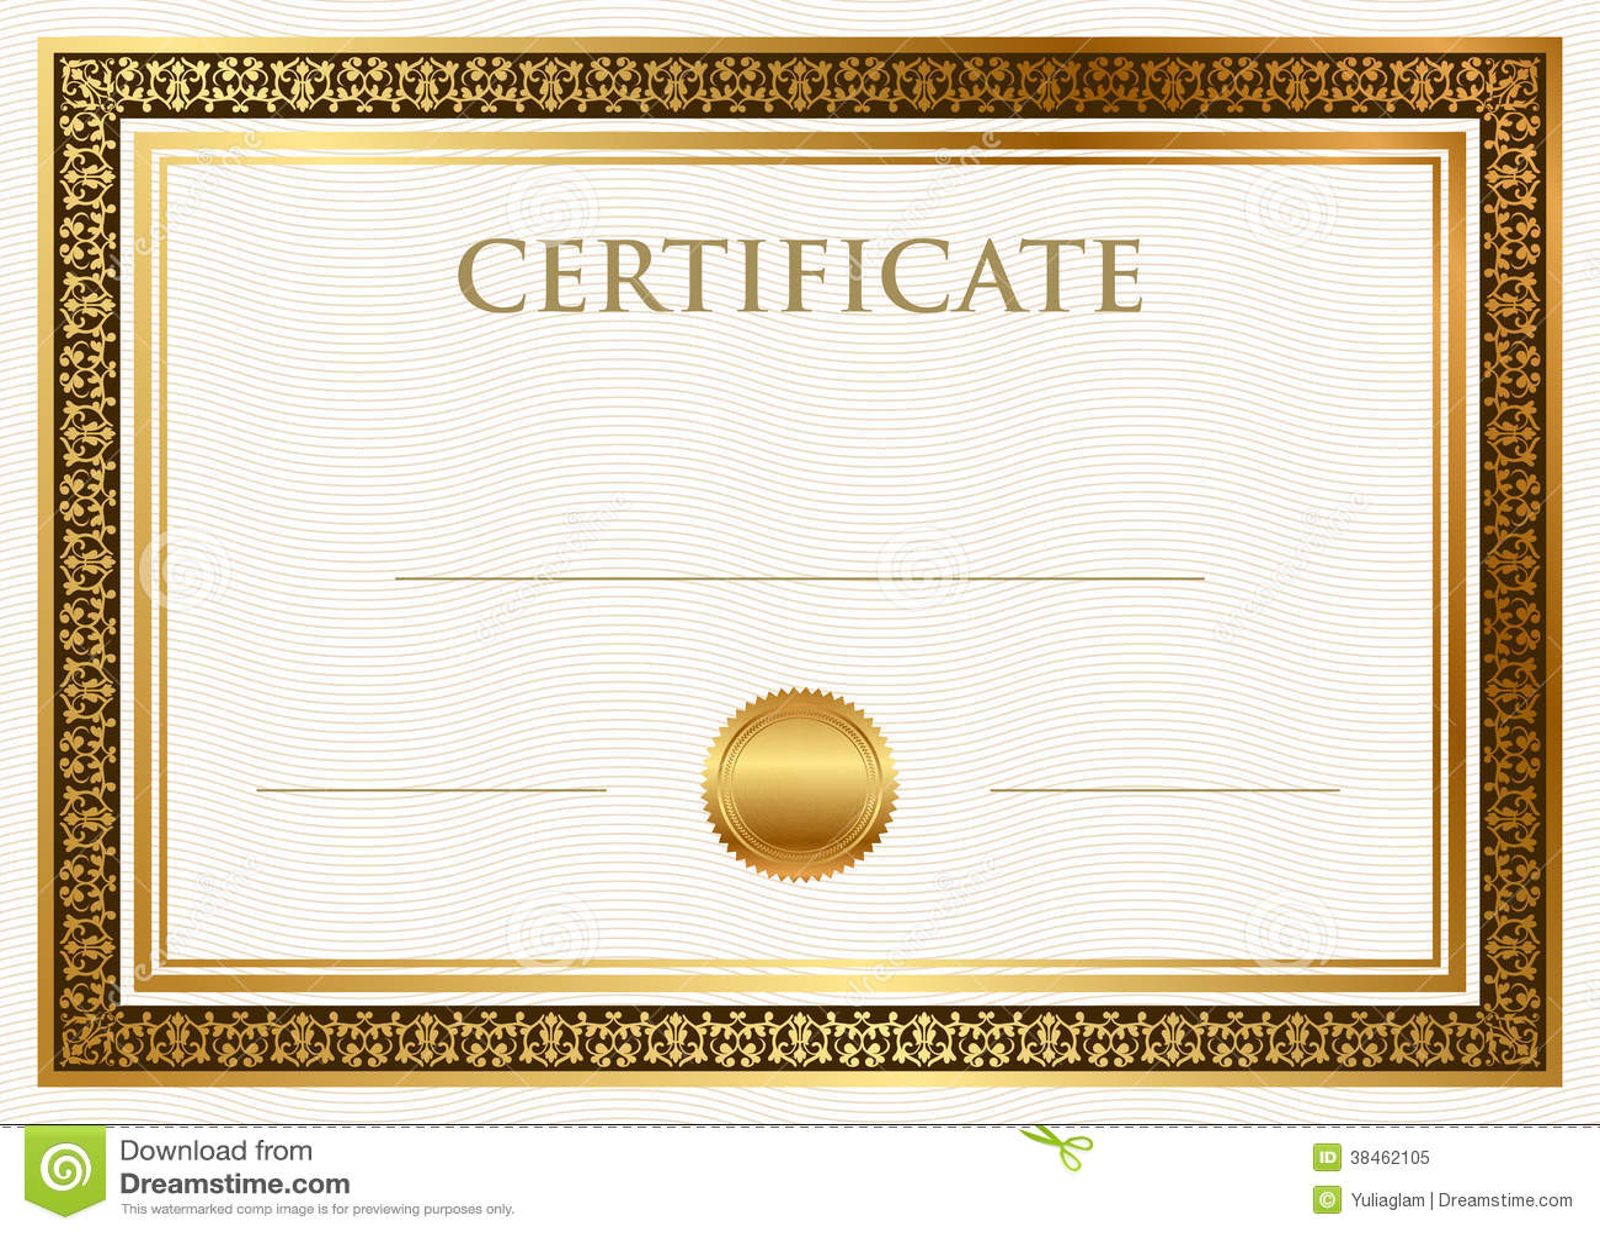 certificate of achievement template free